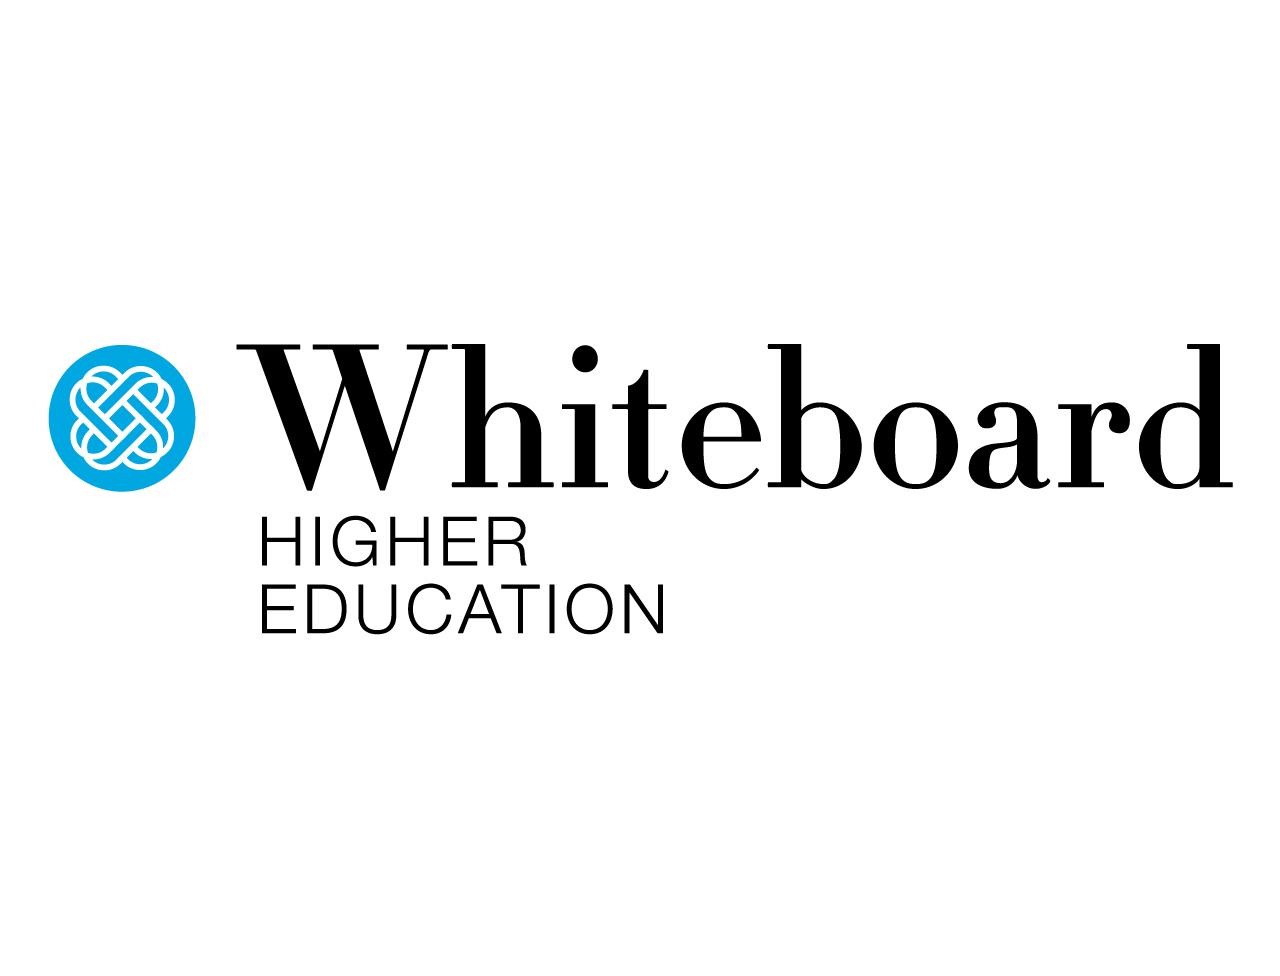 Whiteboard Higher Education